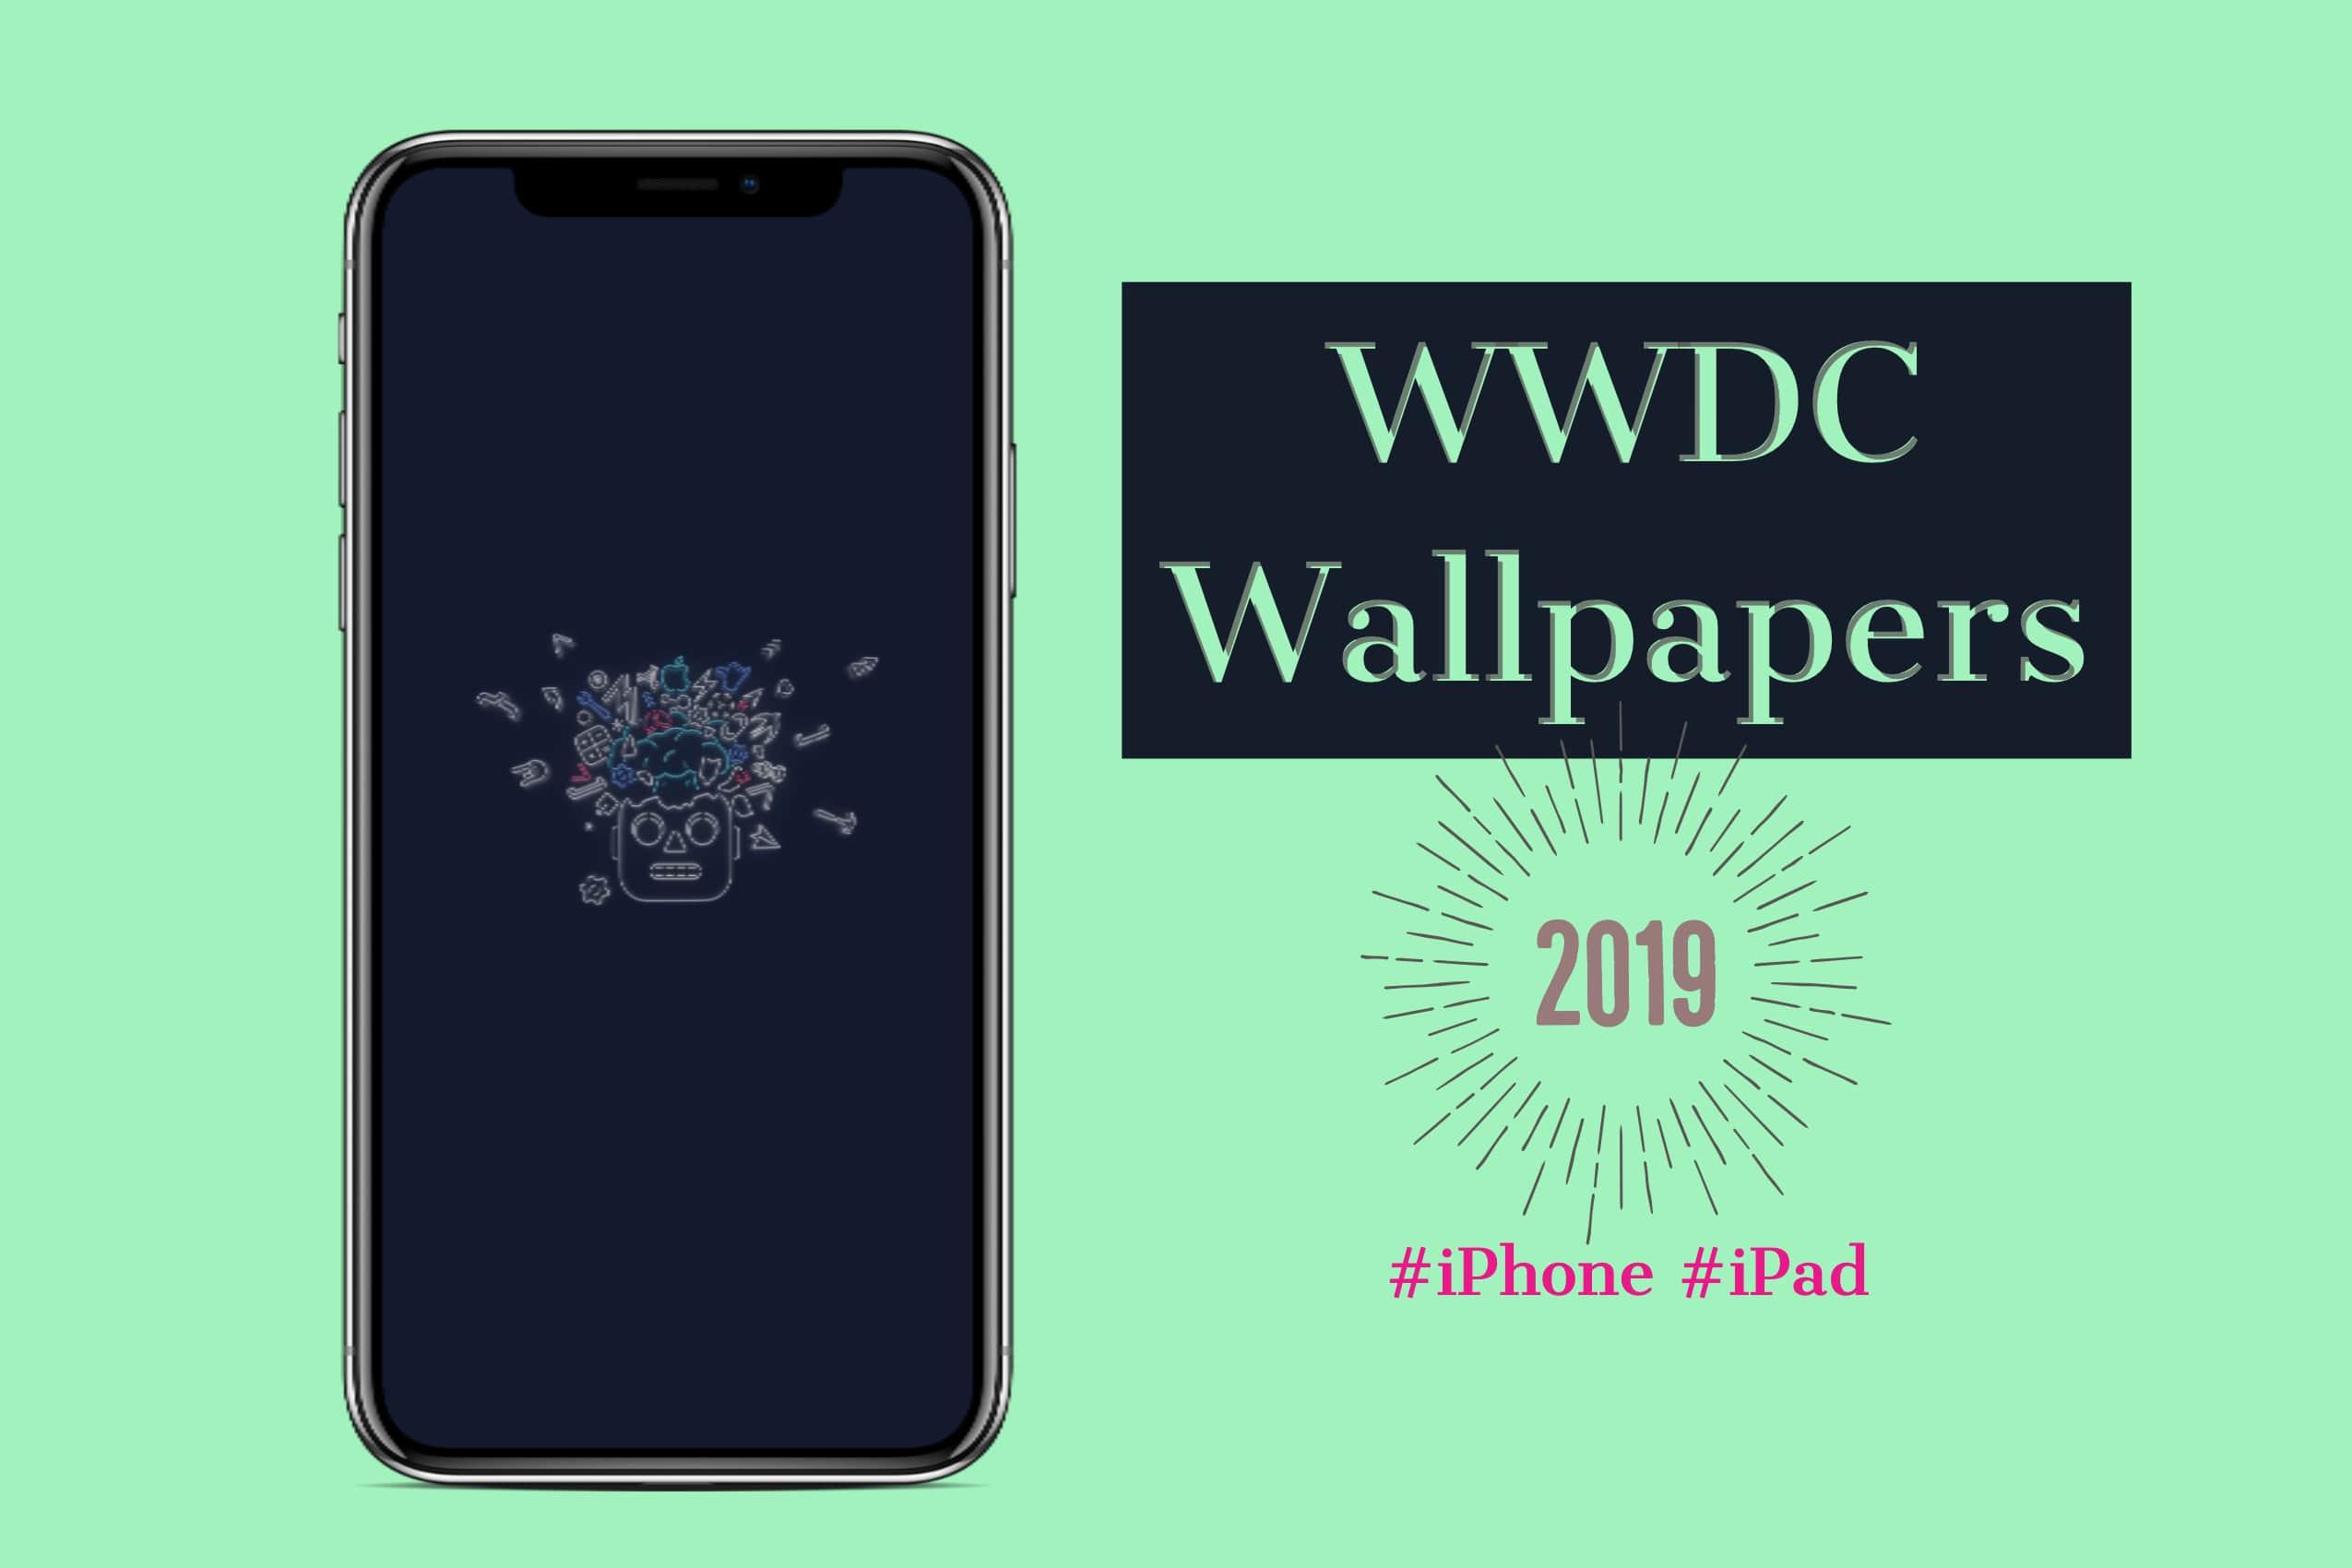 wwdc-2019-wallpapers-iphone-ipad